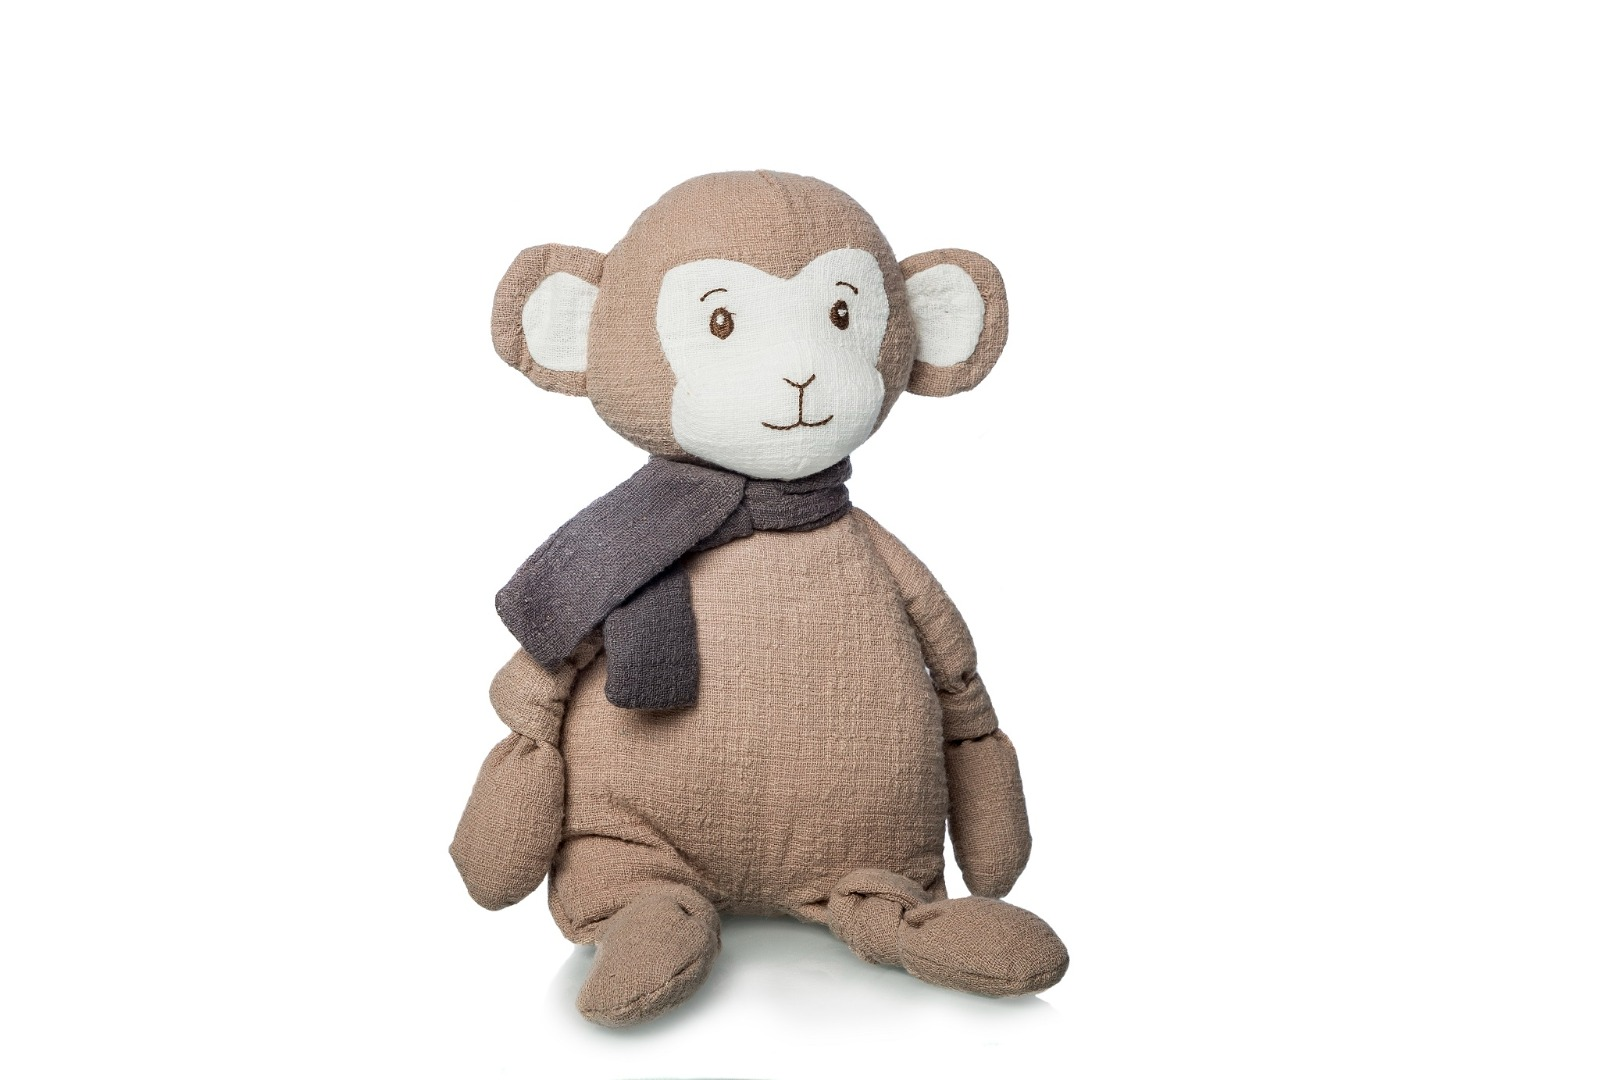 Peluche de mono de algodón para bebé